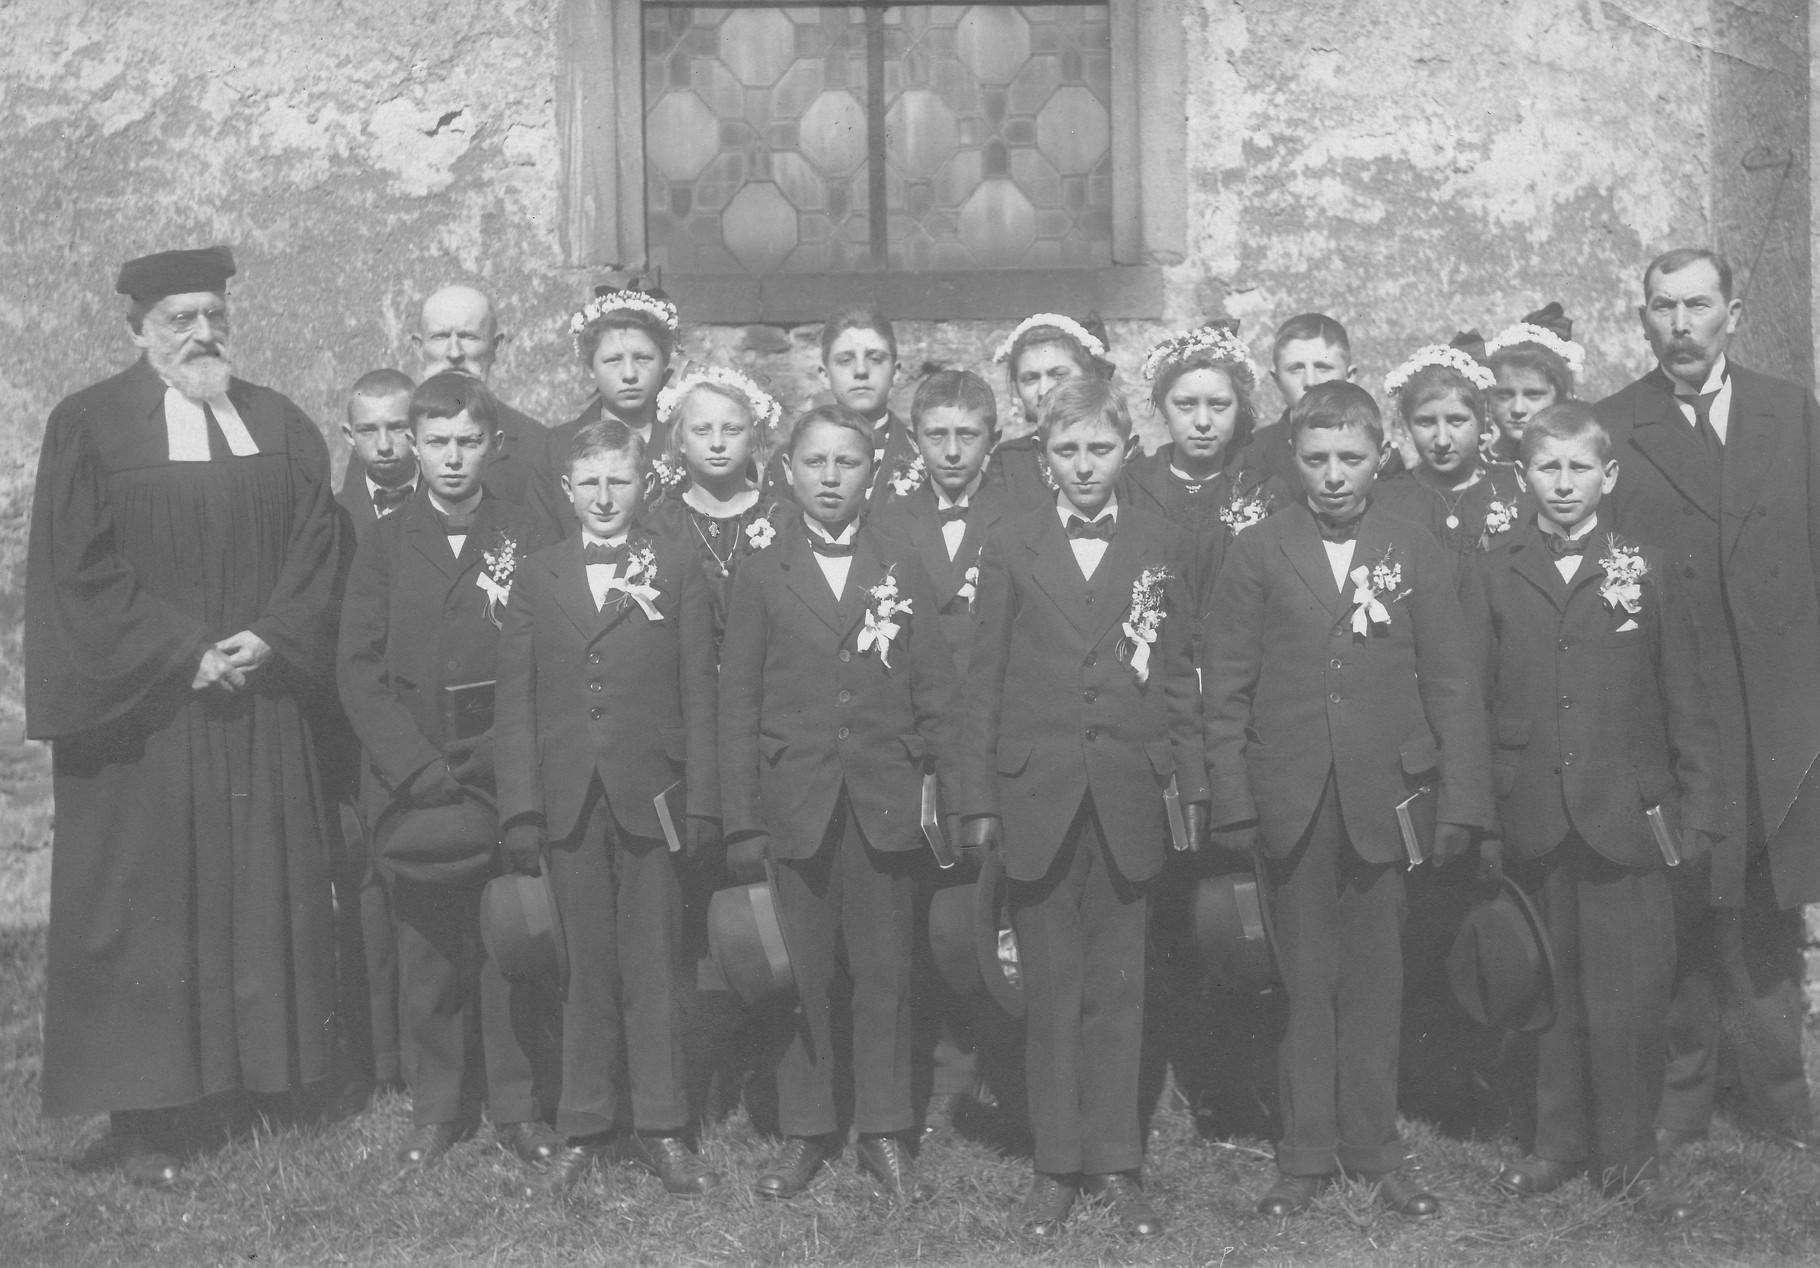 1921 (Bild:Knerndel,Christel)